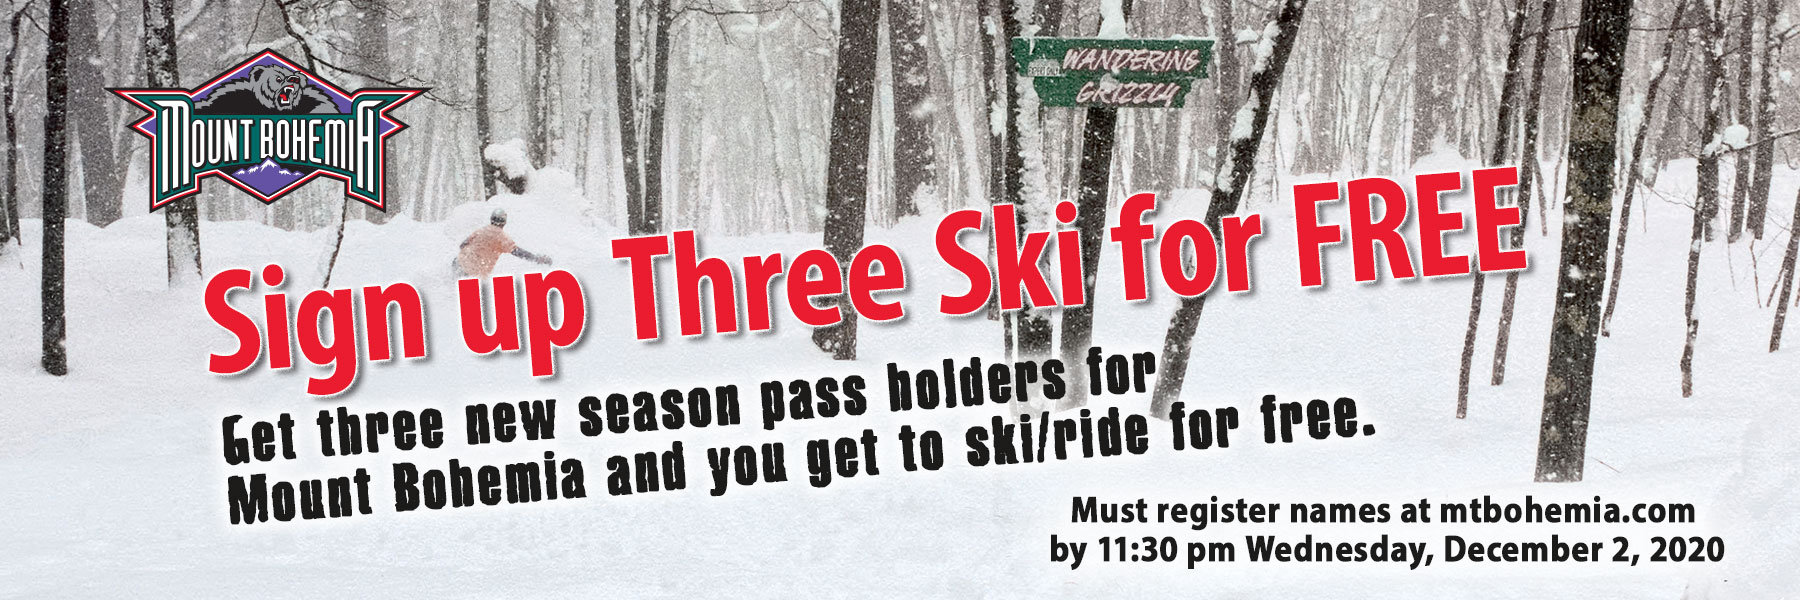 2020 Sign up Three Ski Free